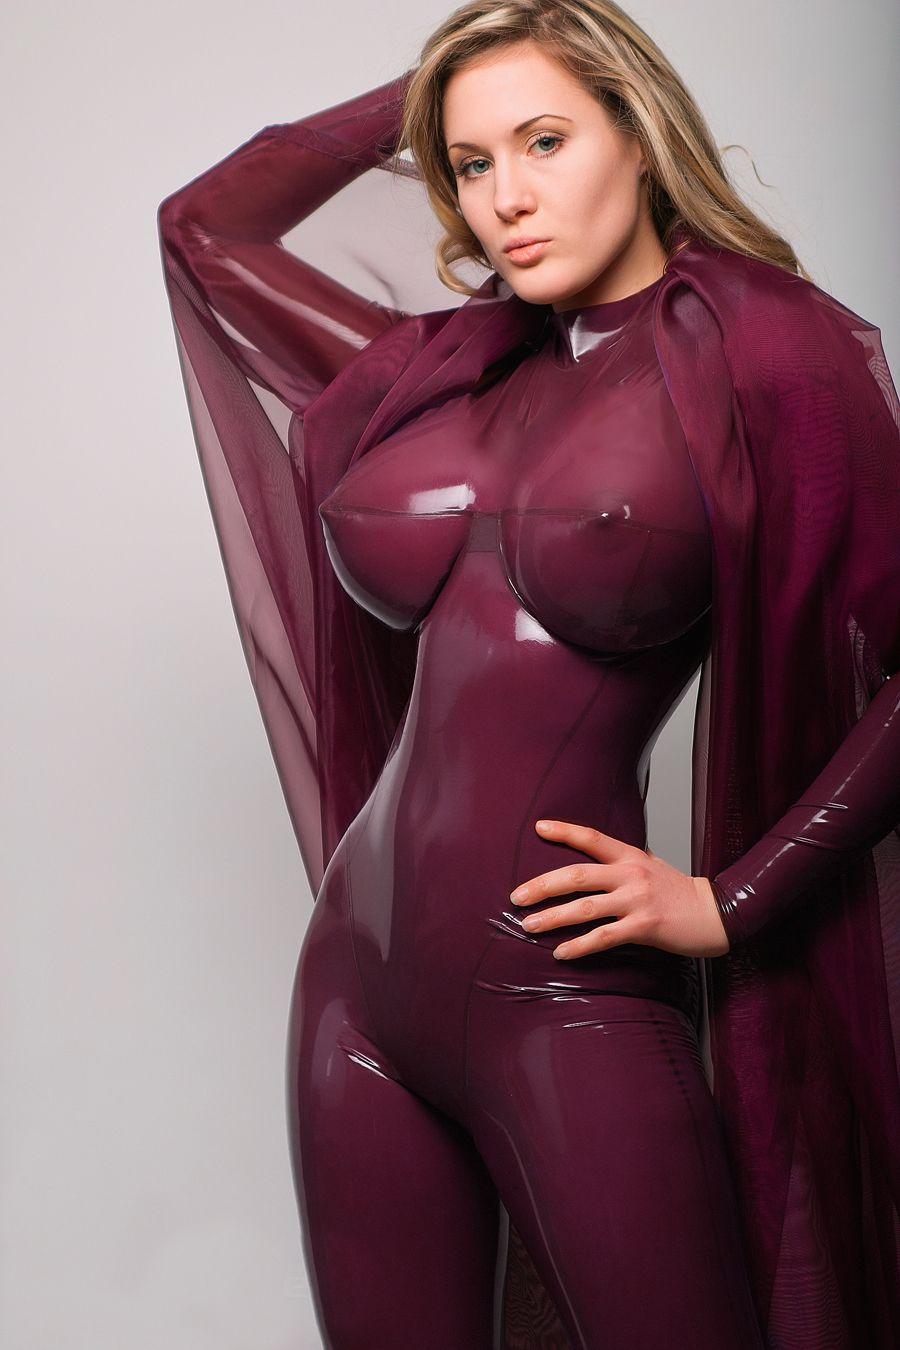 katee sackhoff nude full frontal